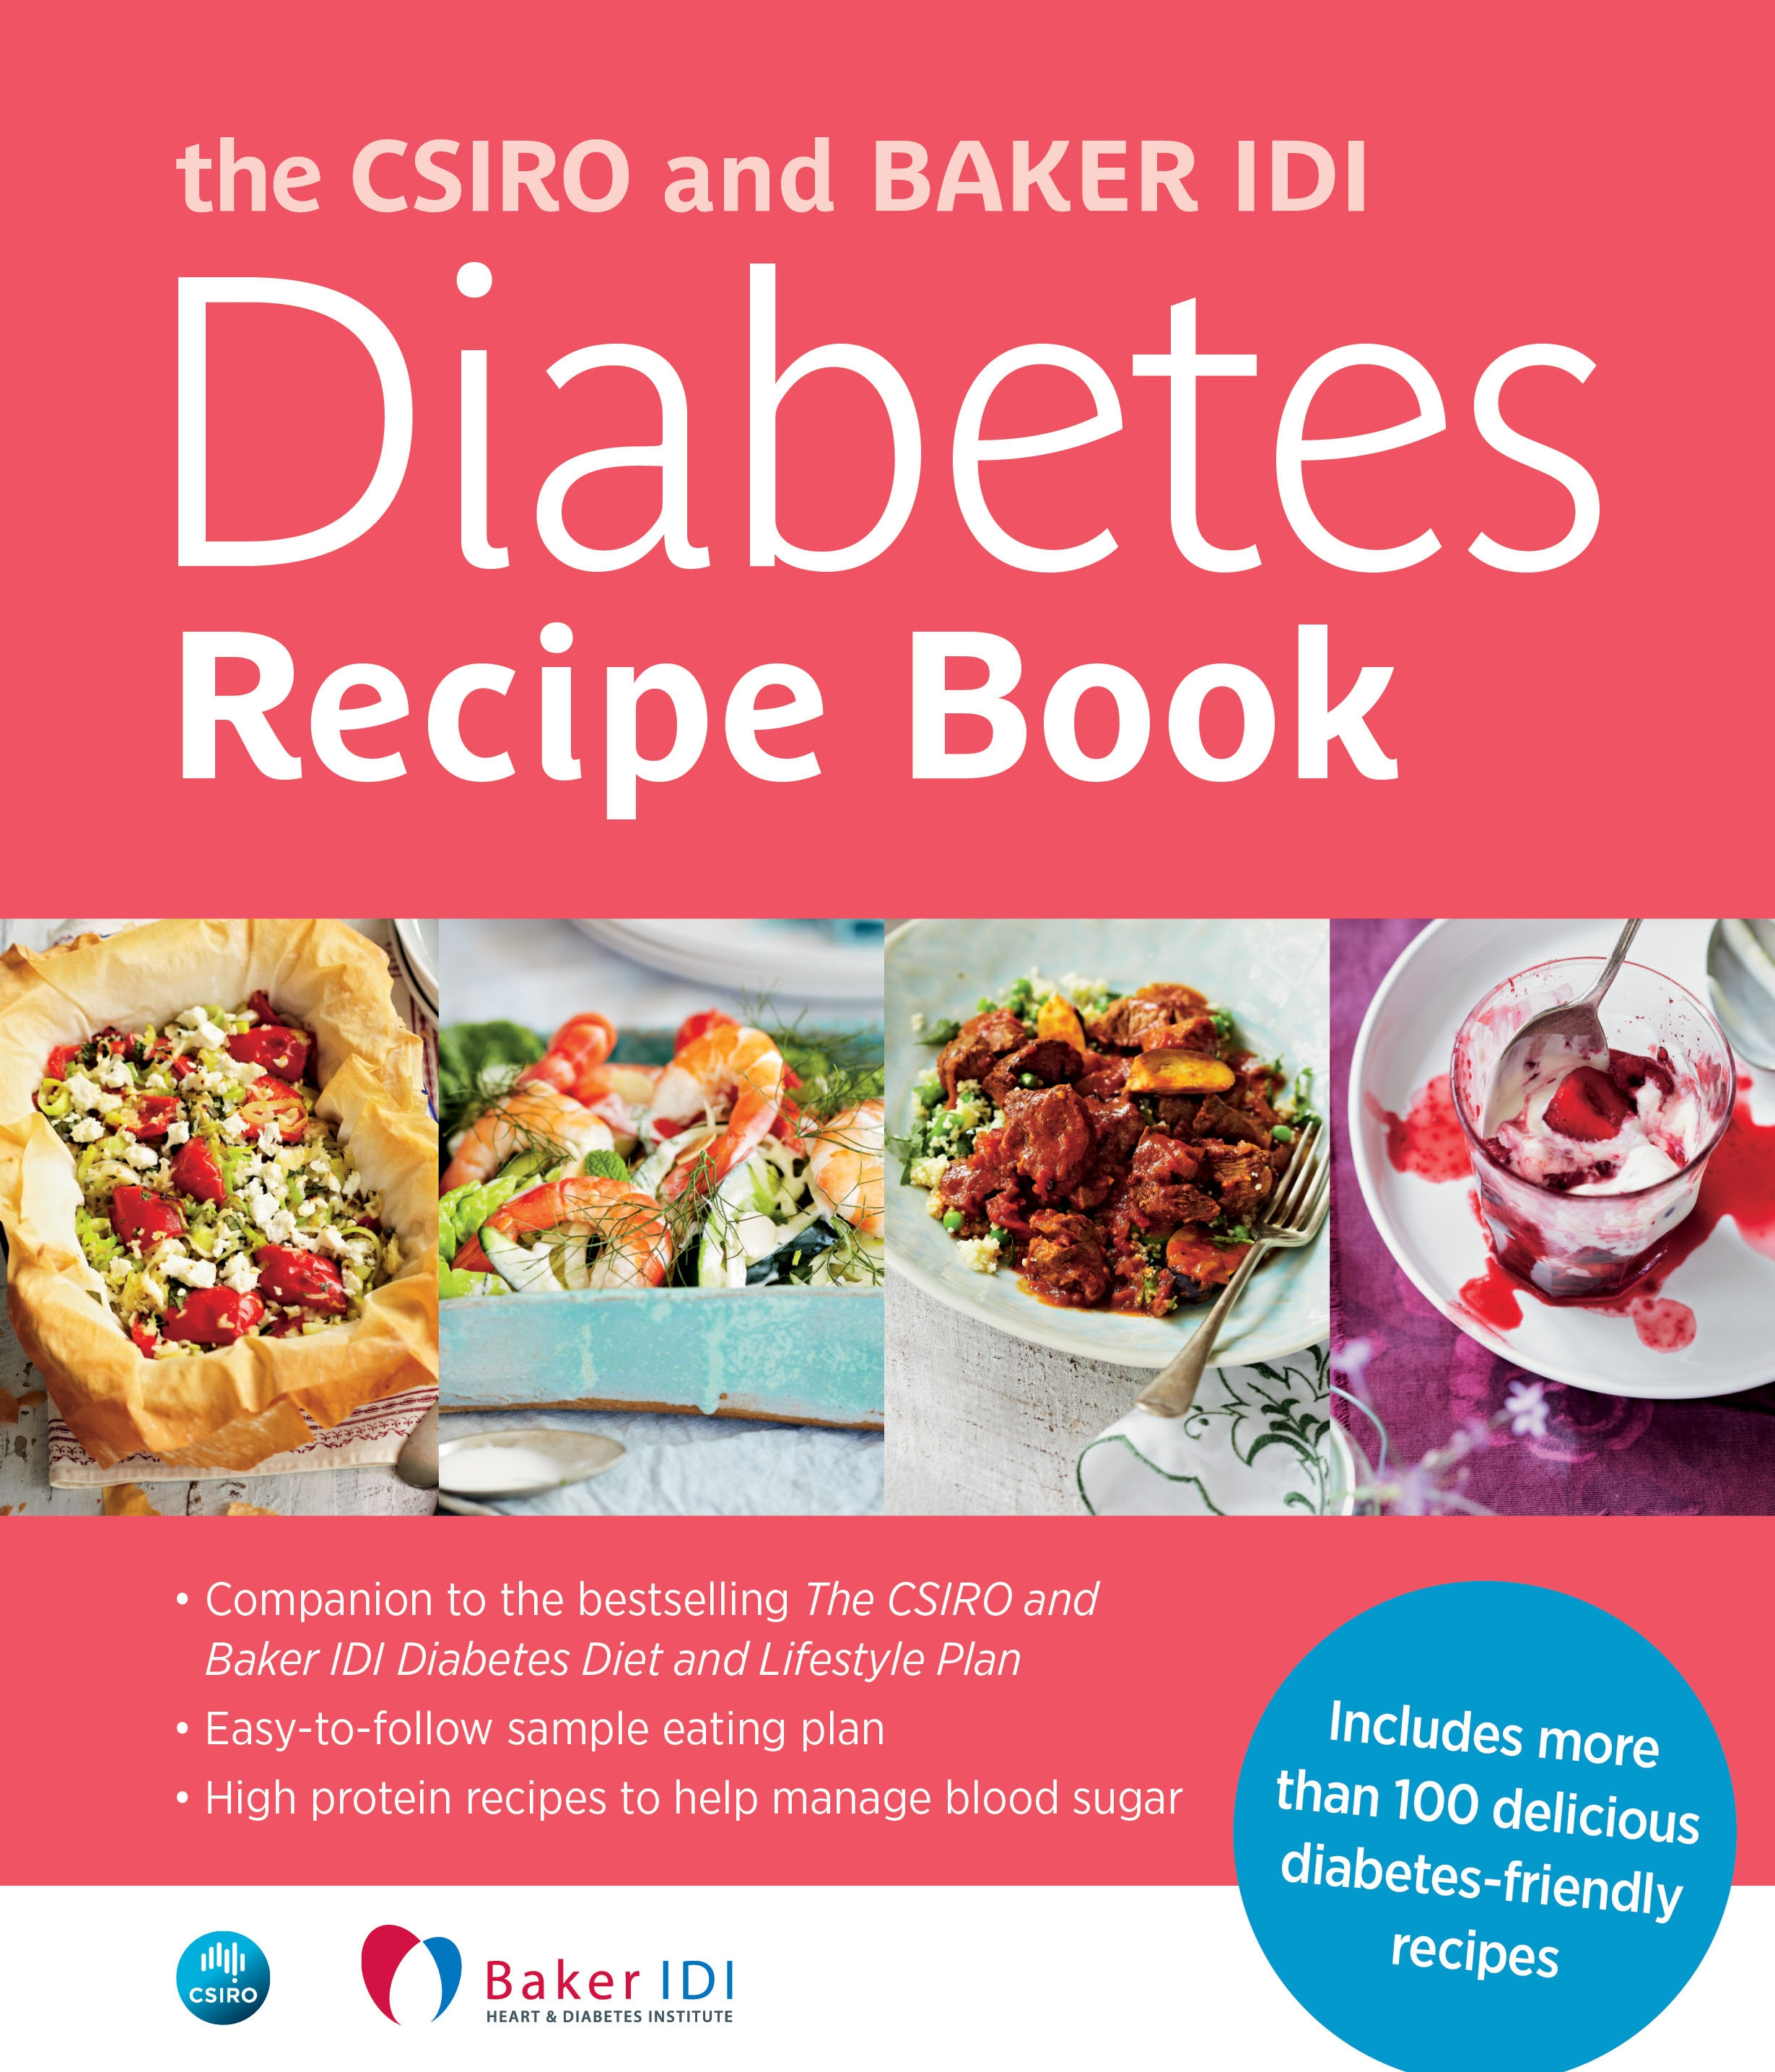 health canada diabetes food guide